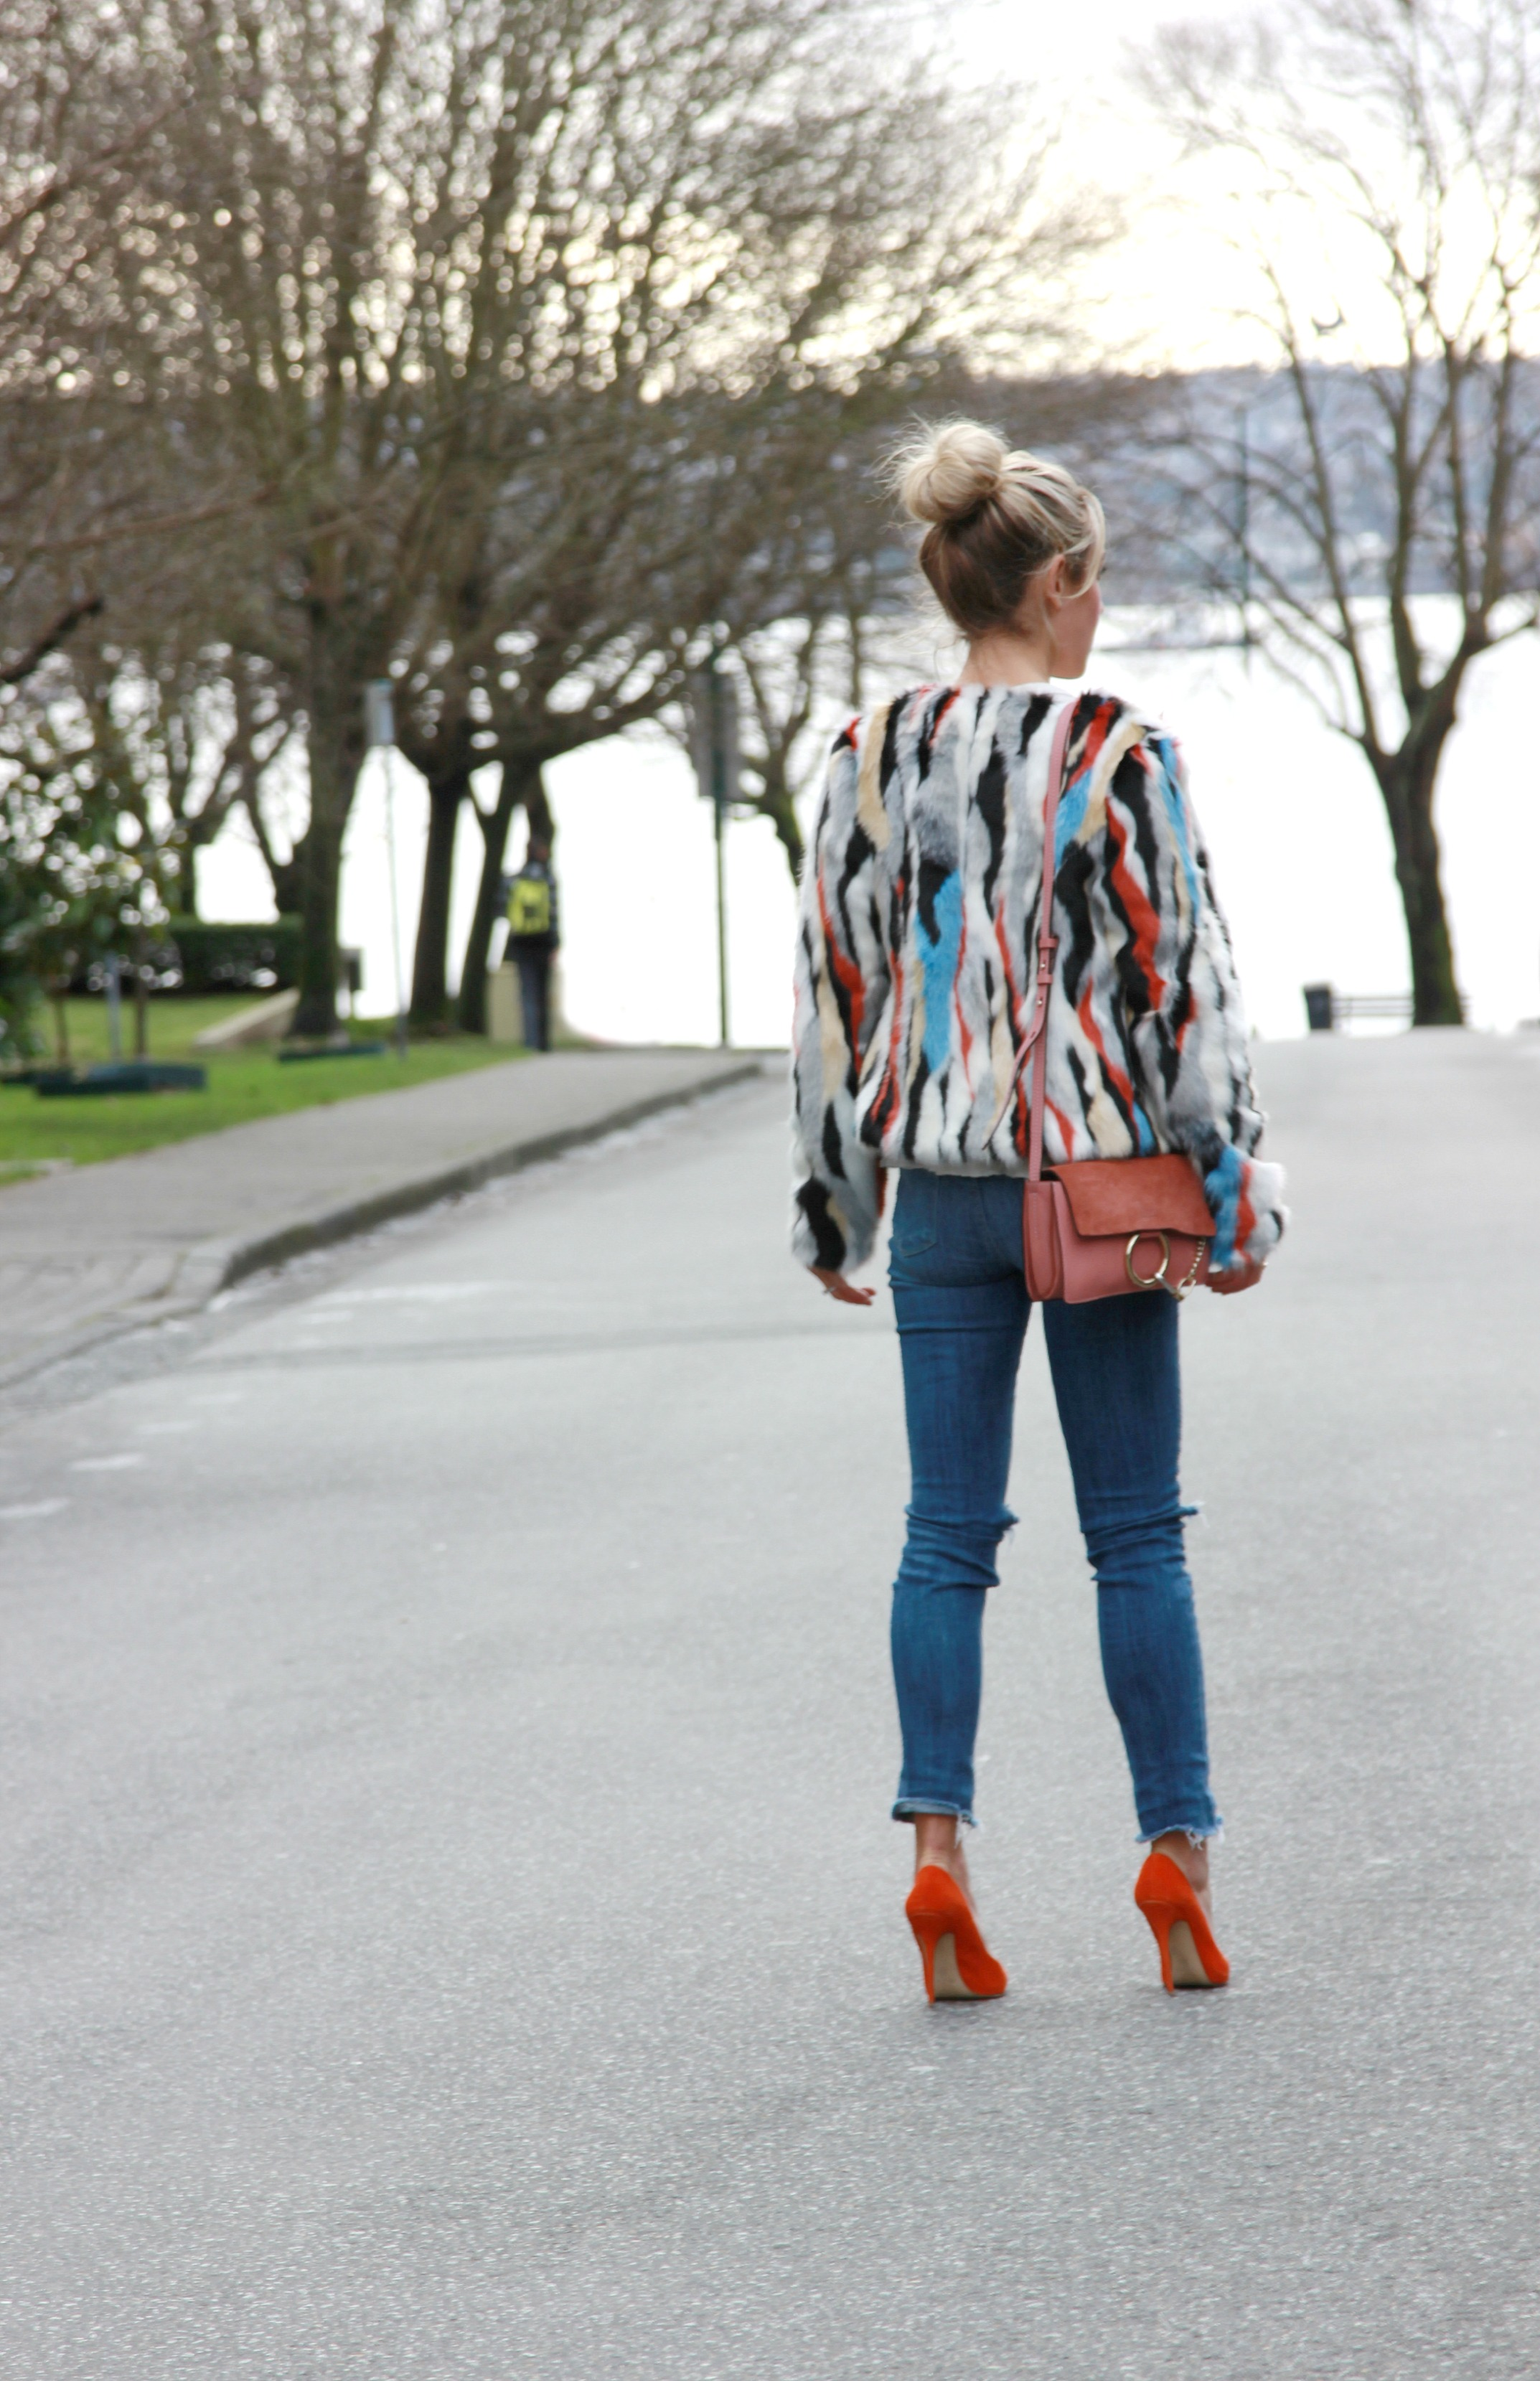 The Great Tee, Jakke Faux Fur Jacket, Paige Jeans, Chloé Bag, Aldo Shoes